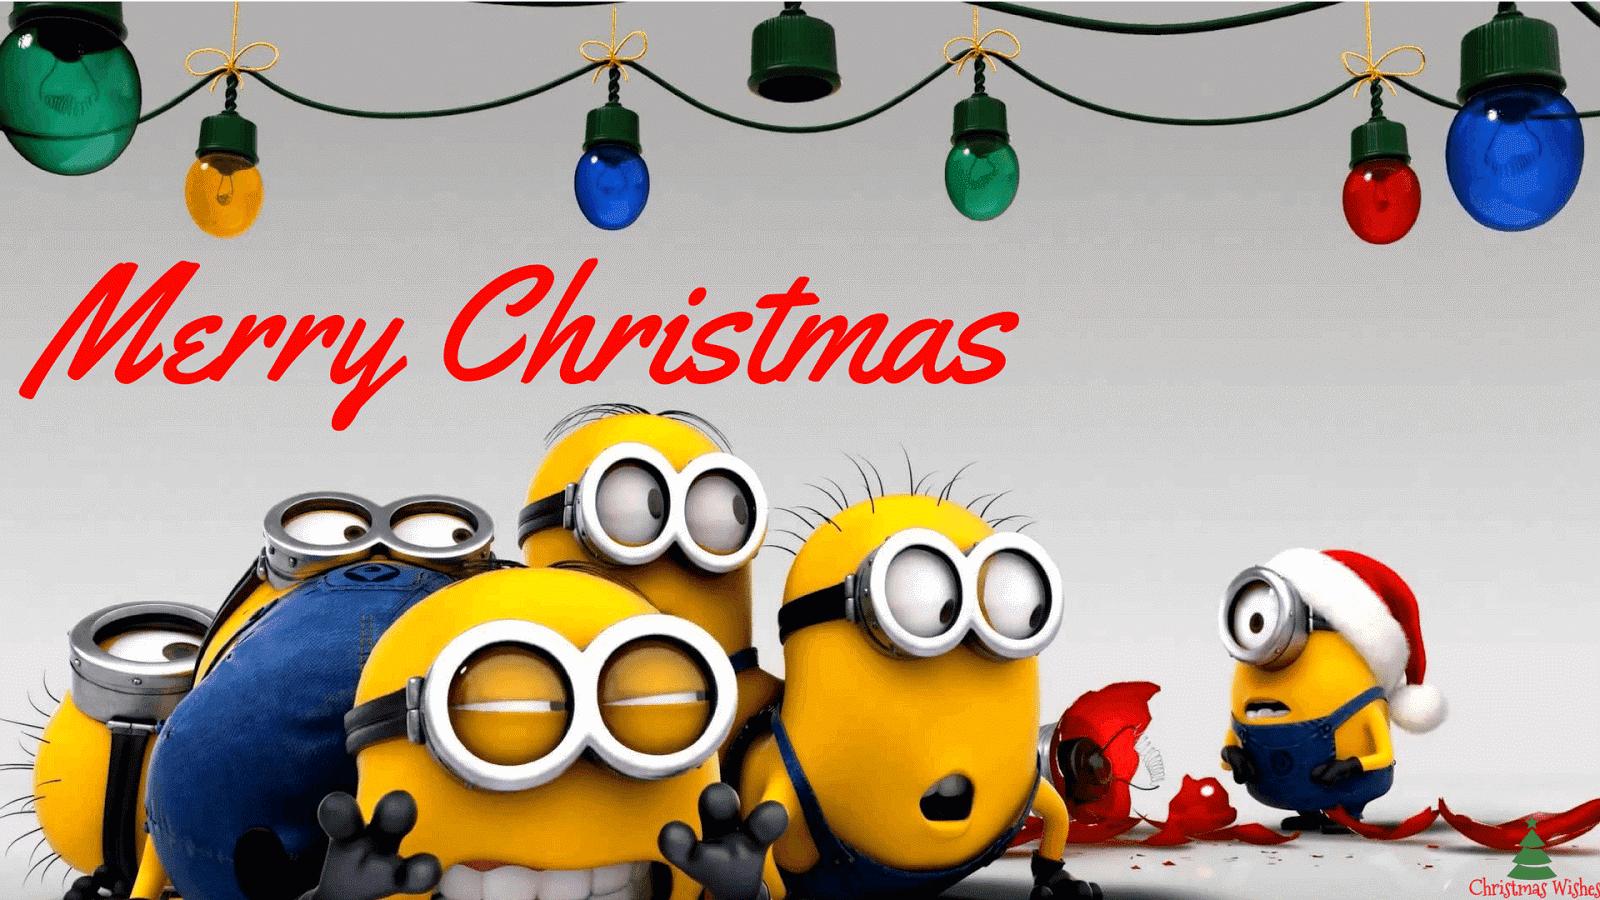 minions christmasminions christmas wallpaper merry christmas minions - Minions Christmas